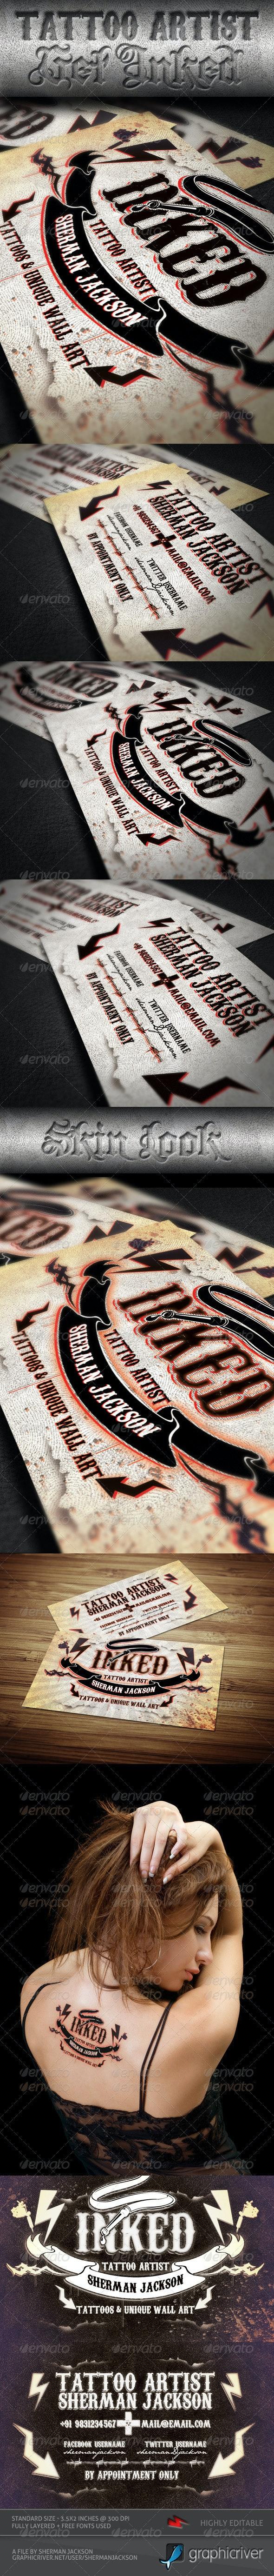 Tattoo Artist Business Card PSD Template - Business Cards Print Templates